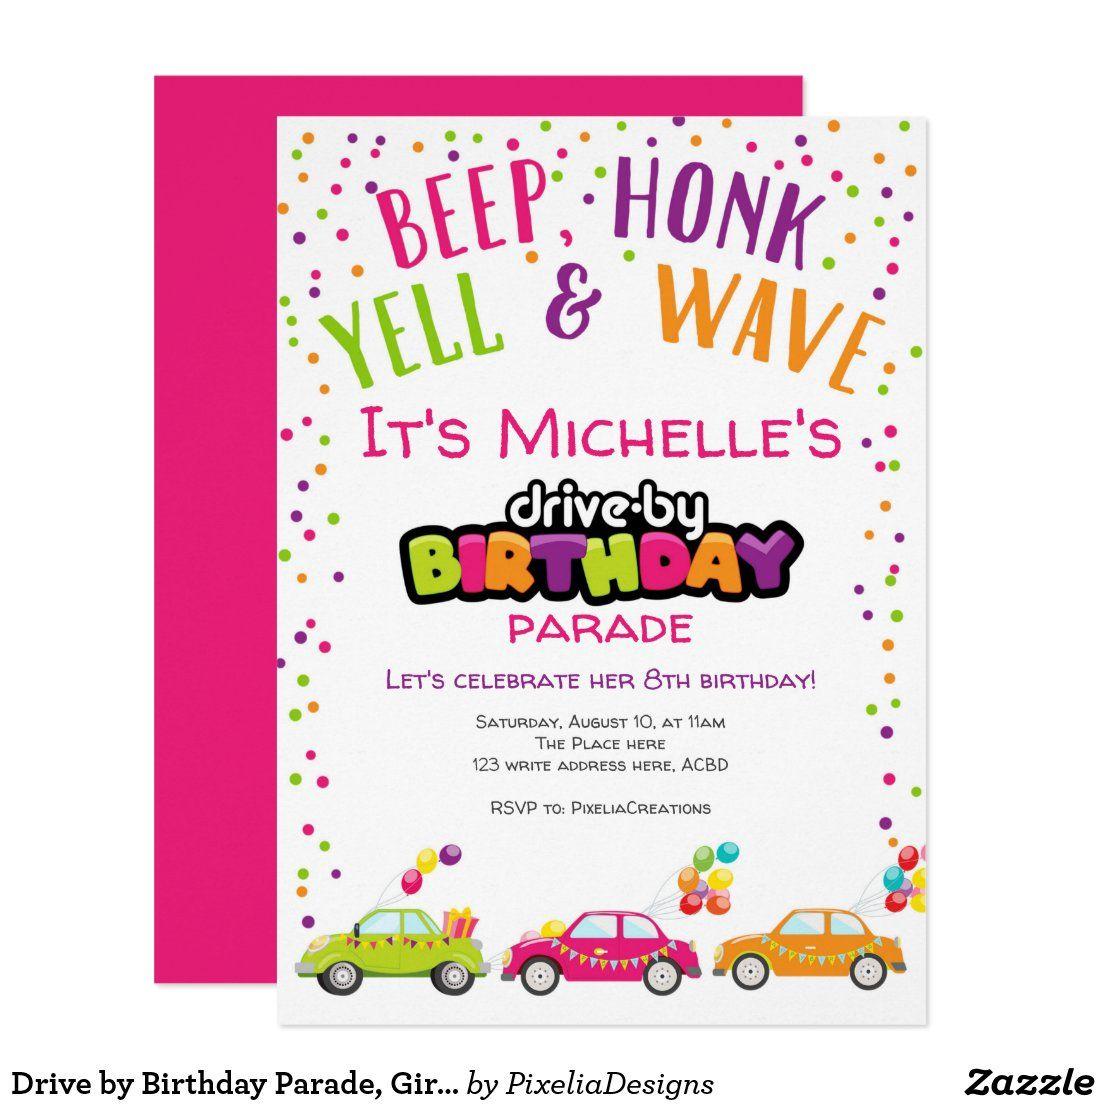 Drive by Birthday Parade, Girl birthday Invitation